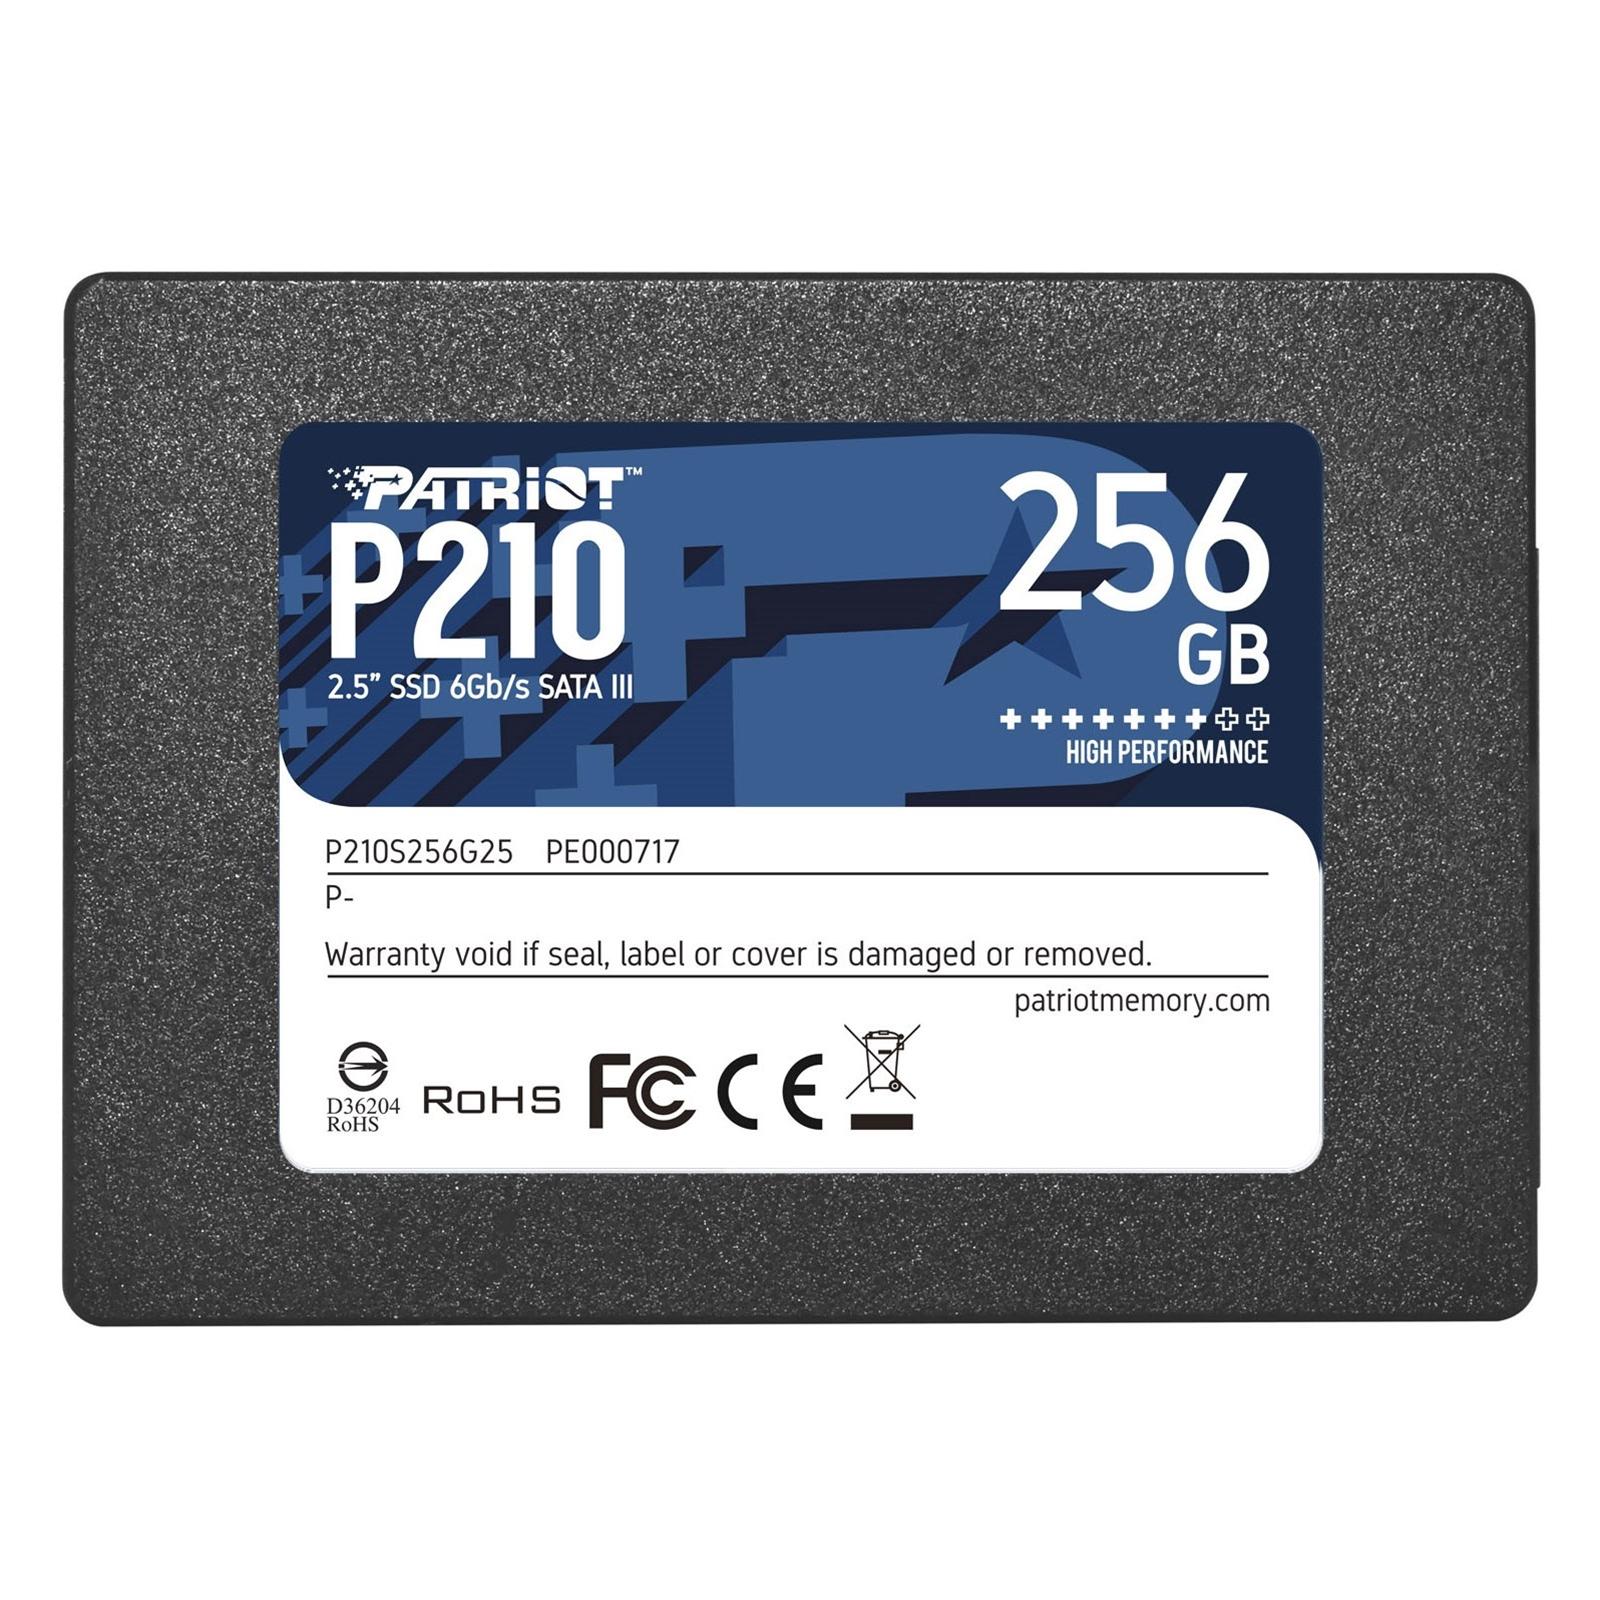 Patriot P210 256GB SATA III SSD